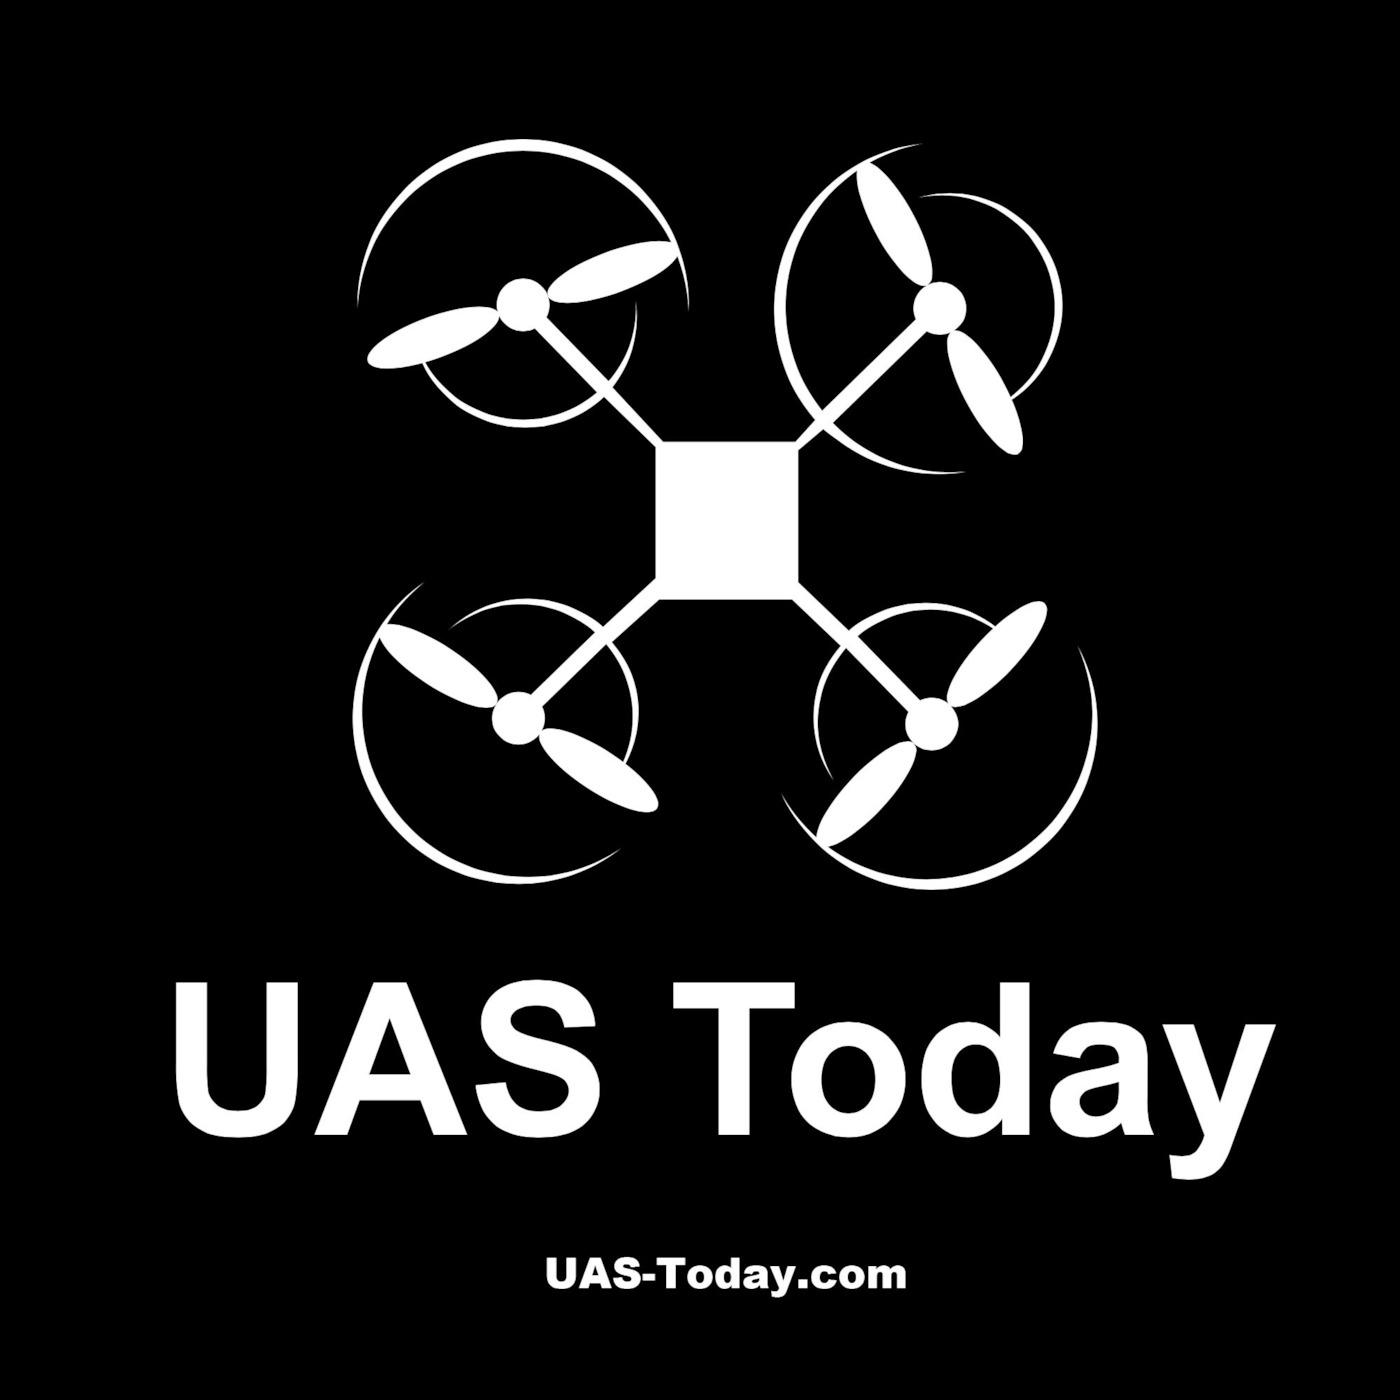 UAS TODAY